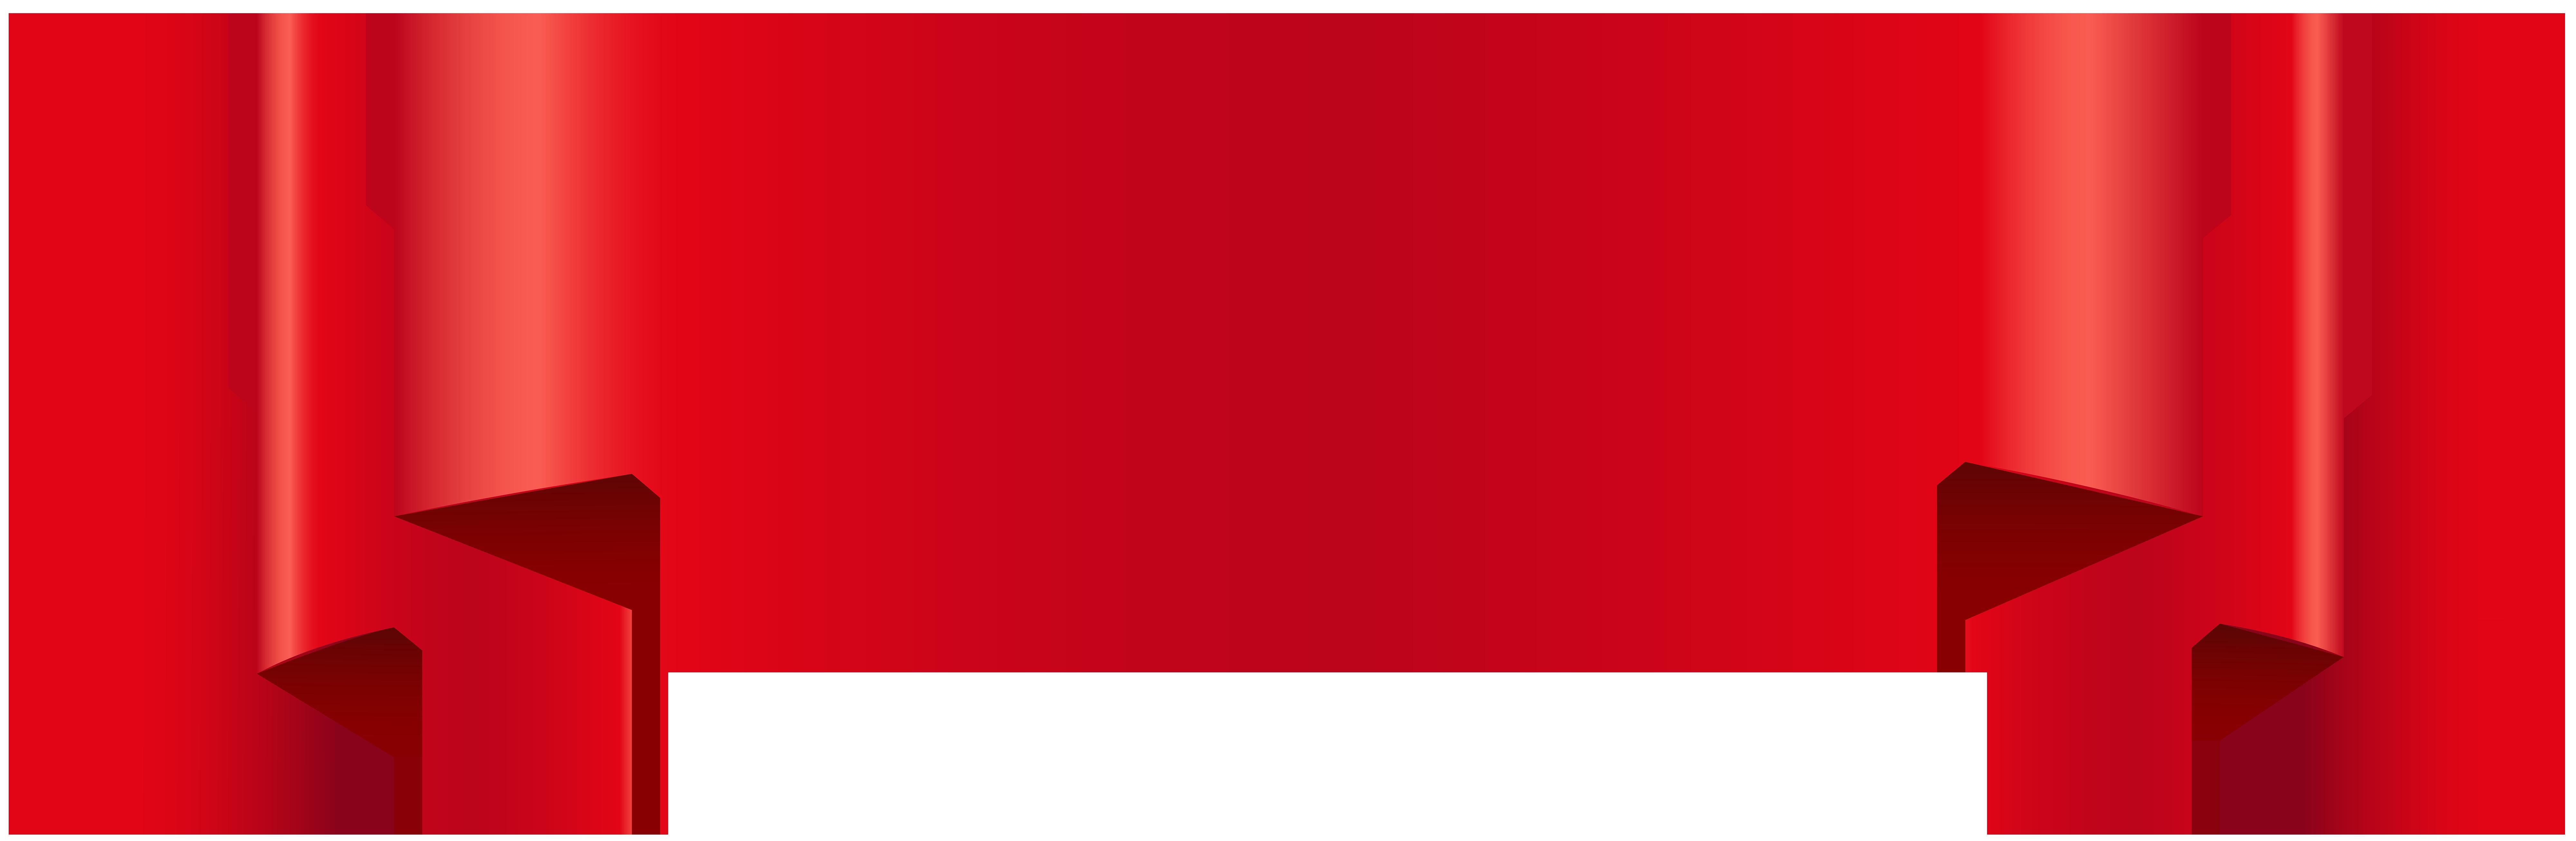 Label clipart red. Banner transparent clip art